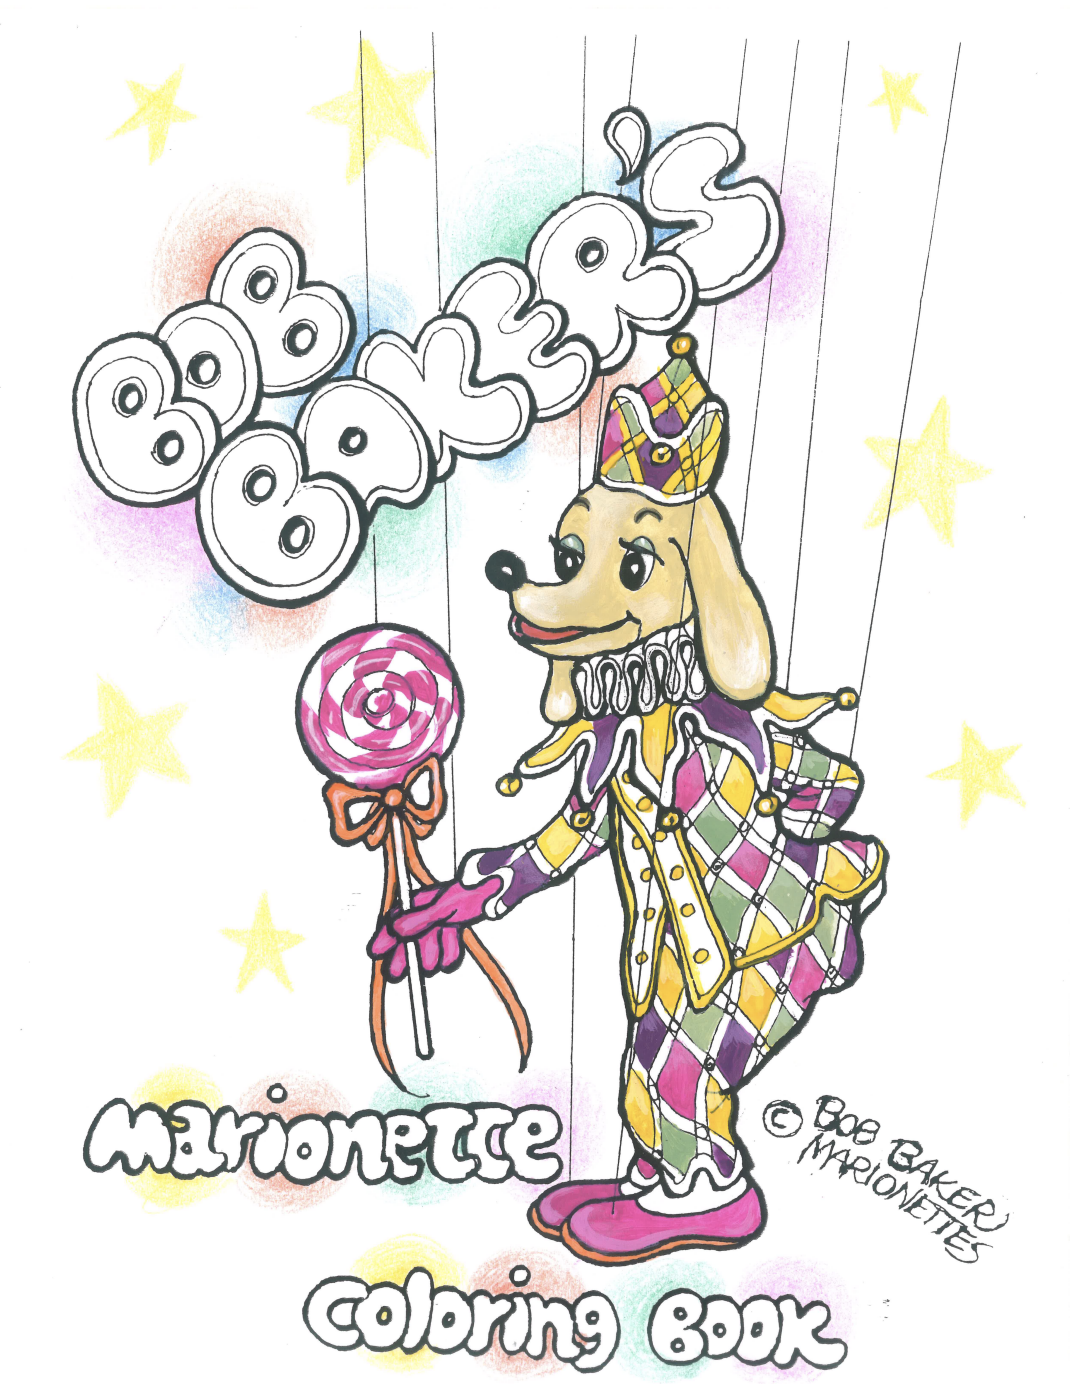 - FREE Digital Download Of Bob Baker's Marionette Coloring Book